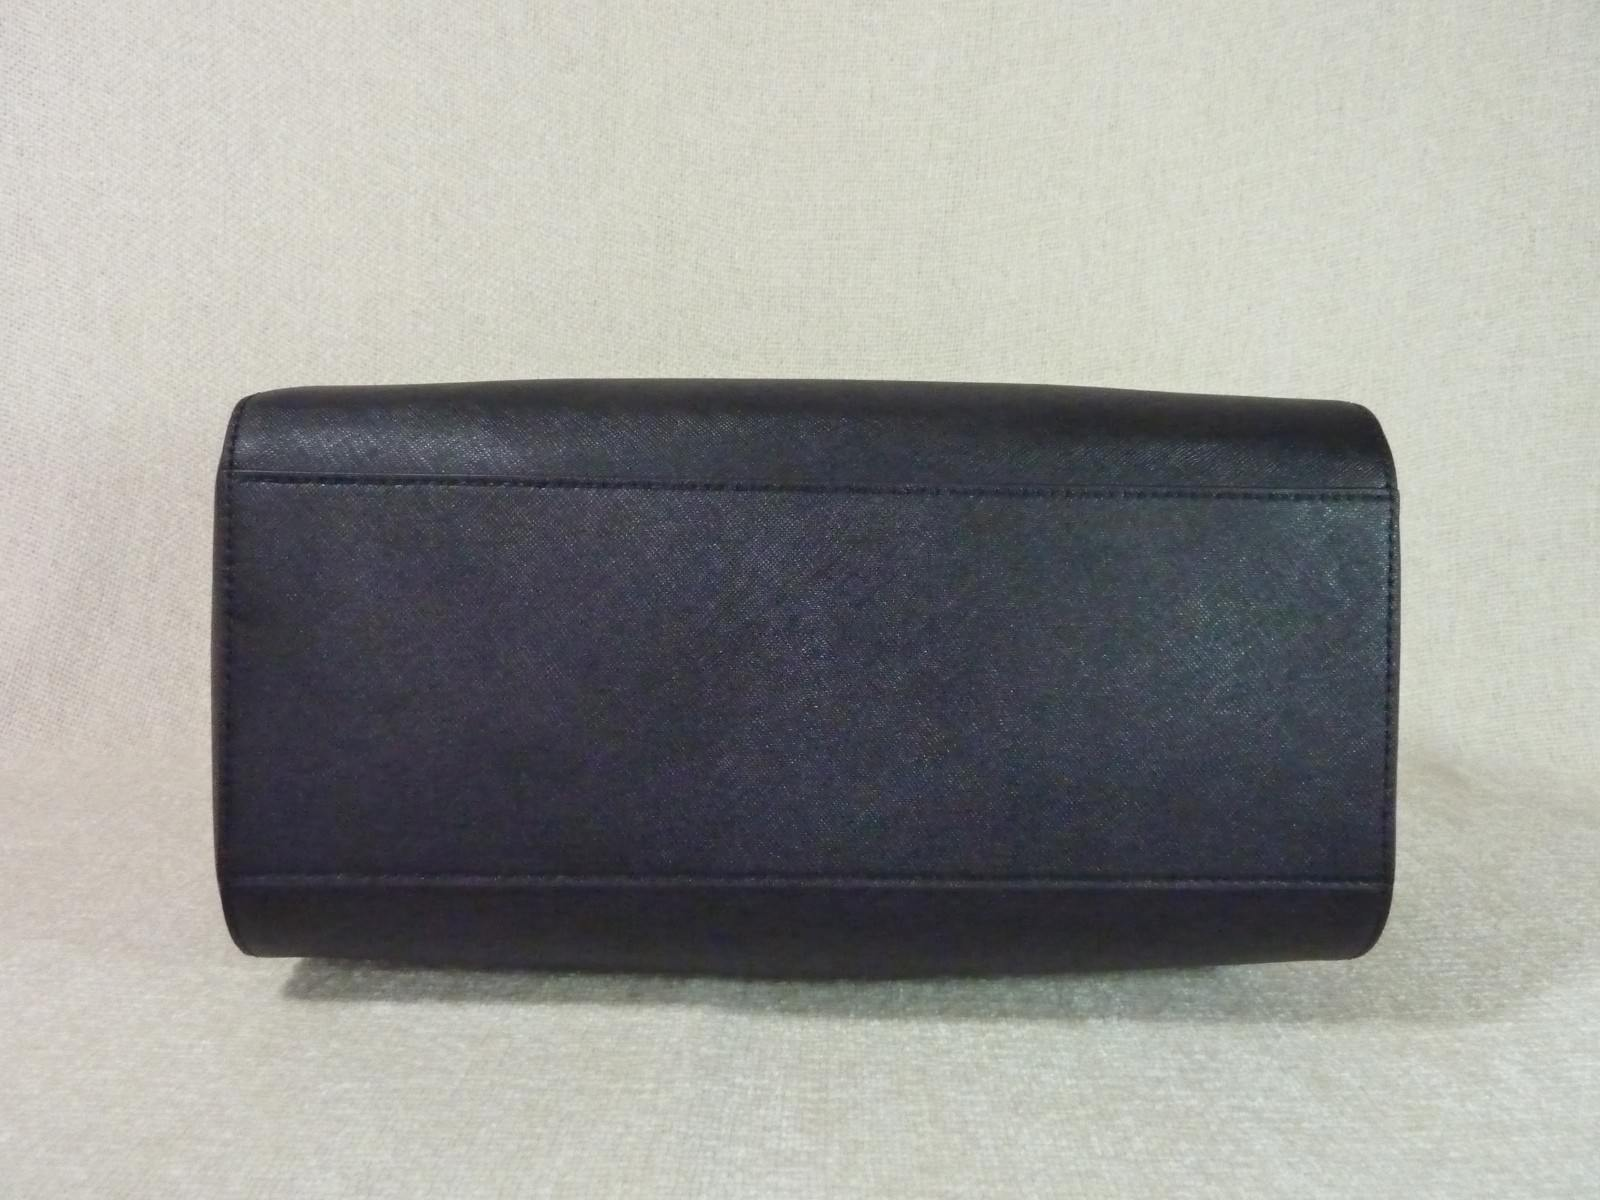 NWT Tory Burch Black Saffiano Leather Classic Emerson Satchel $575